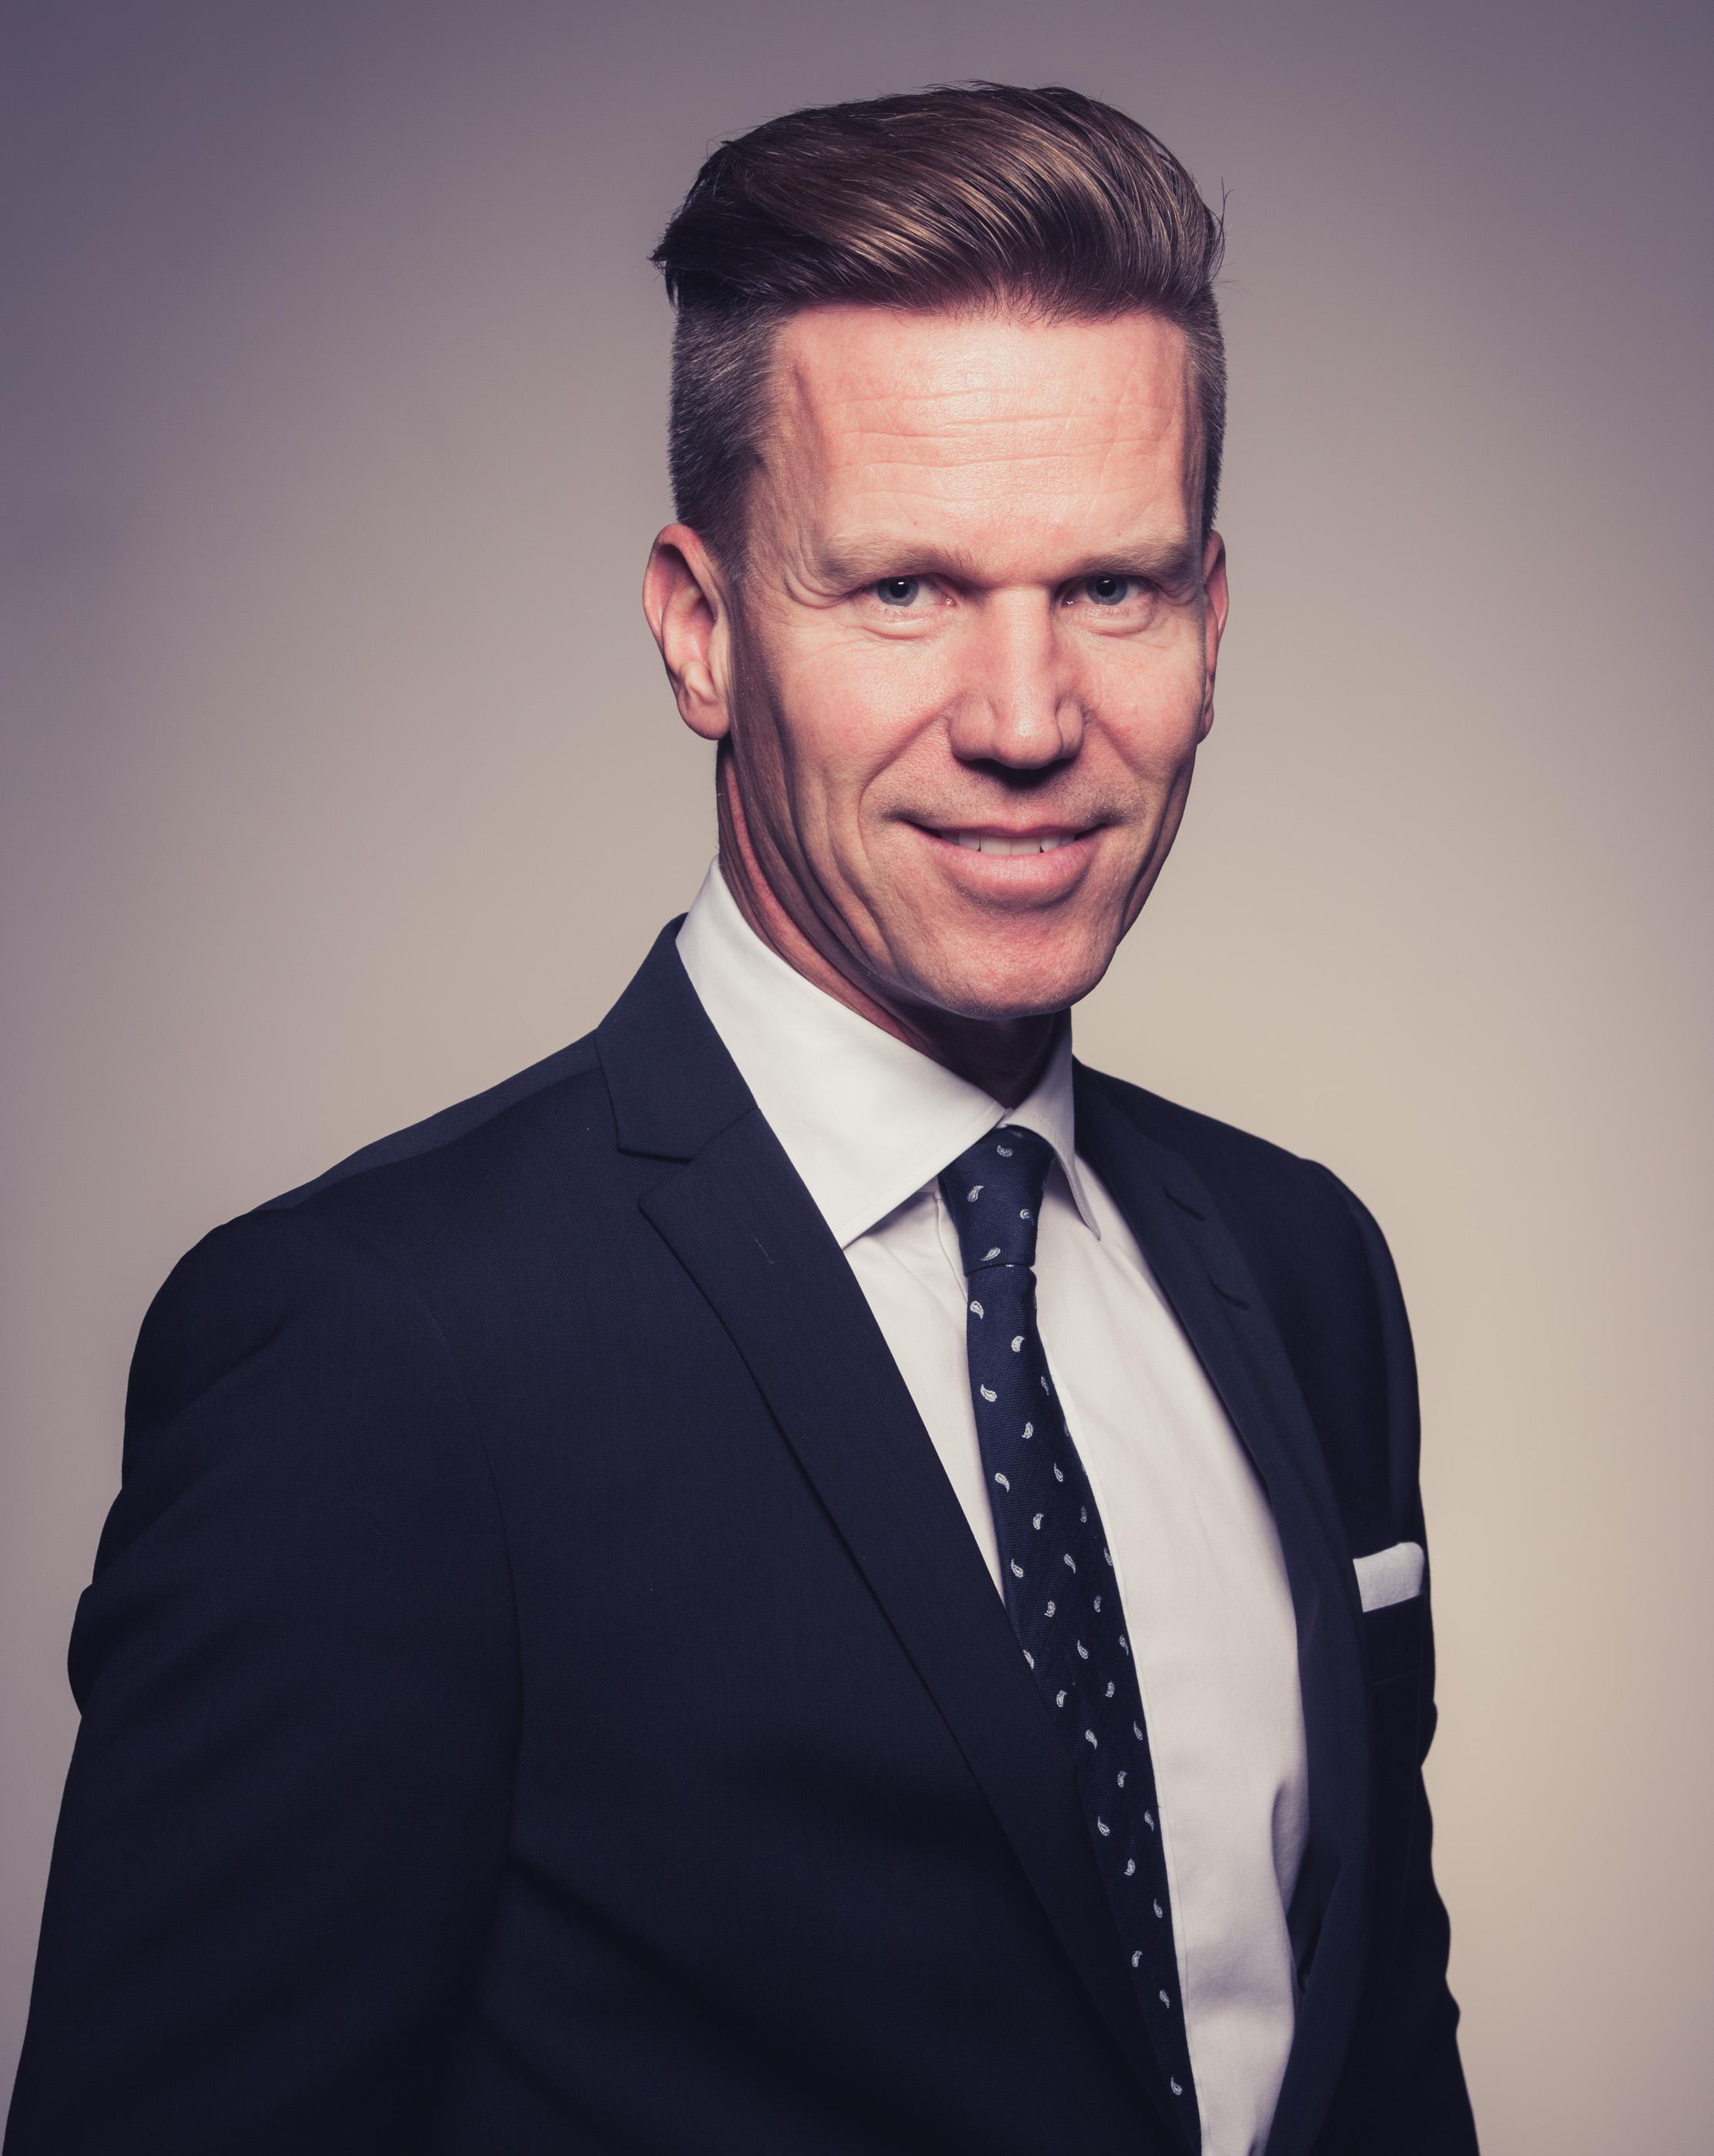 Anders Kristiansen ceo Esprit Juni 2018